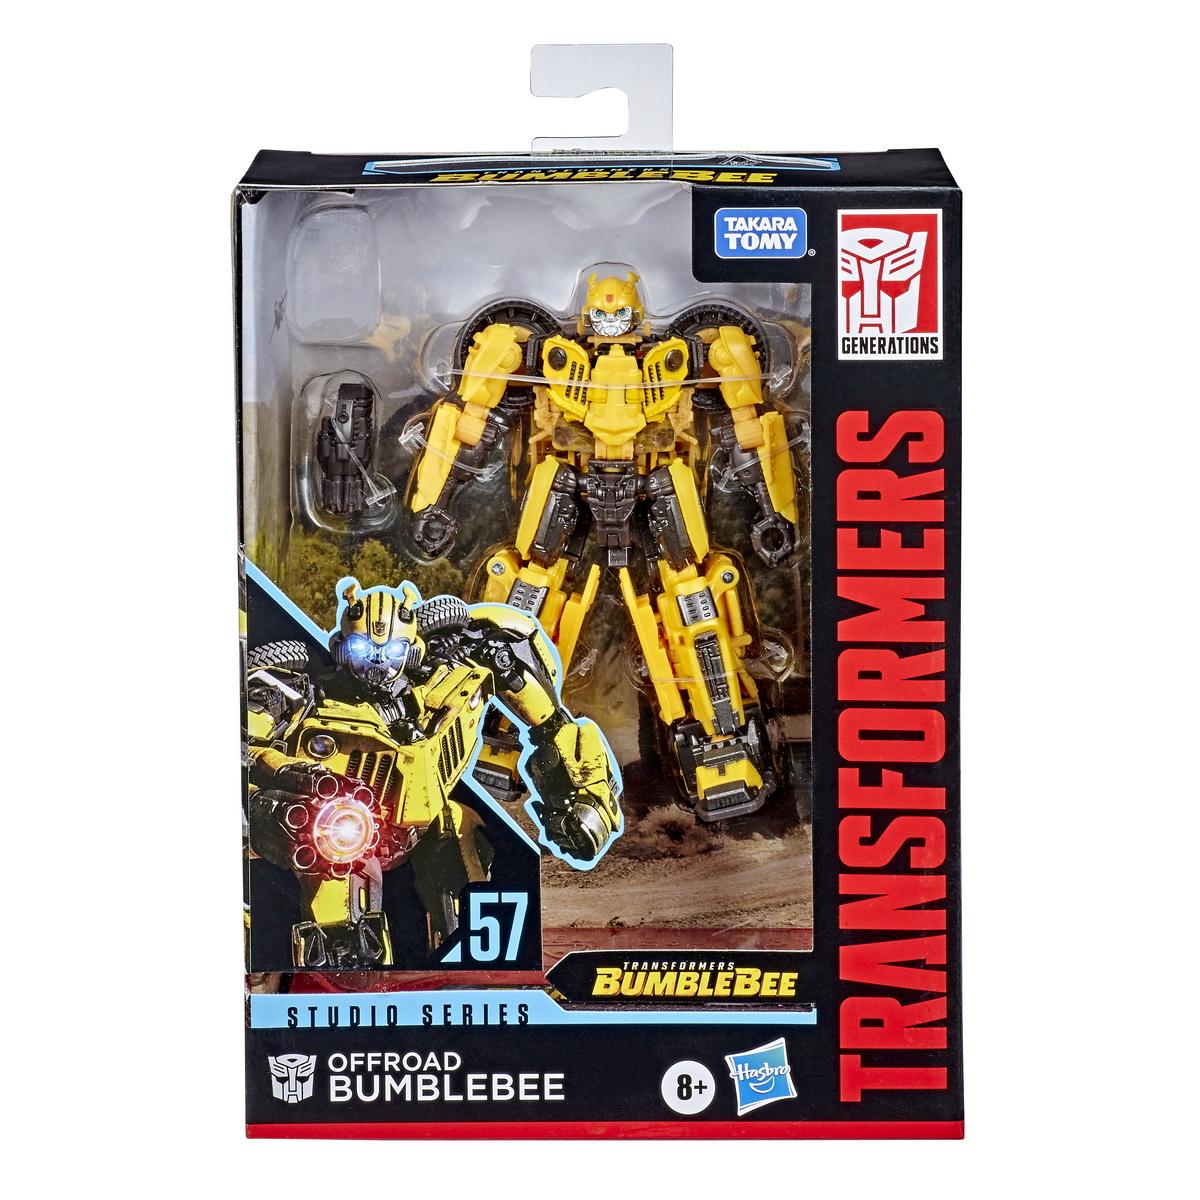 Transformers Generations Deluxe Robot Bumblebee Offroad